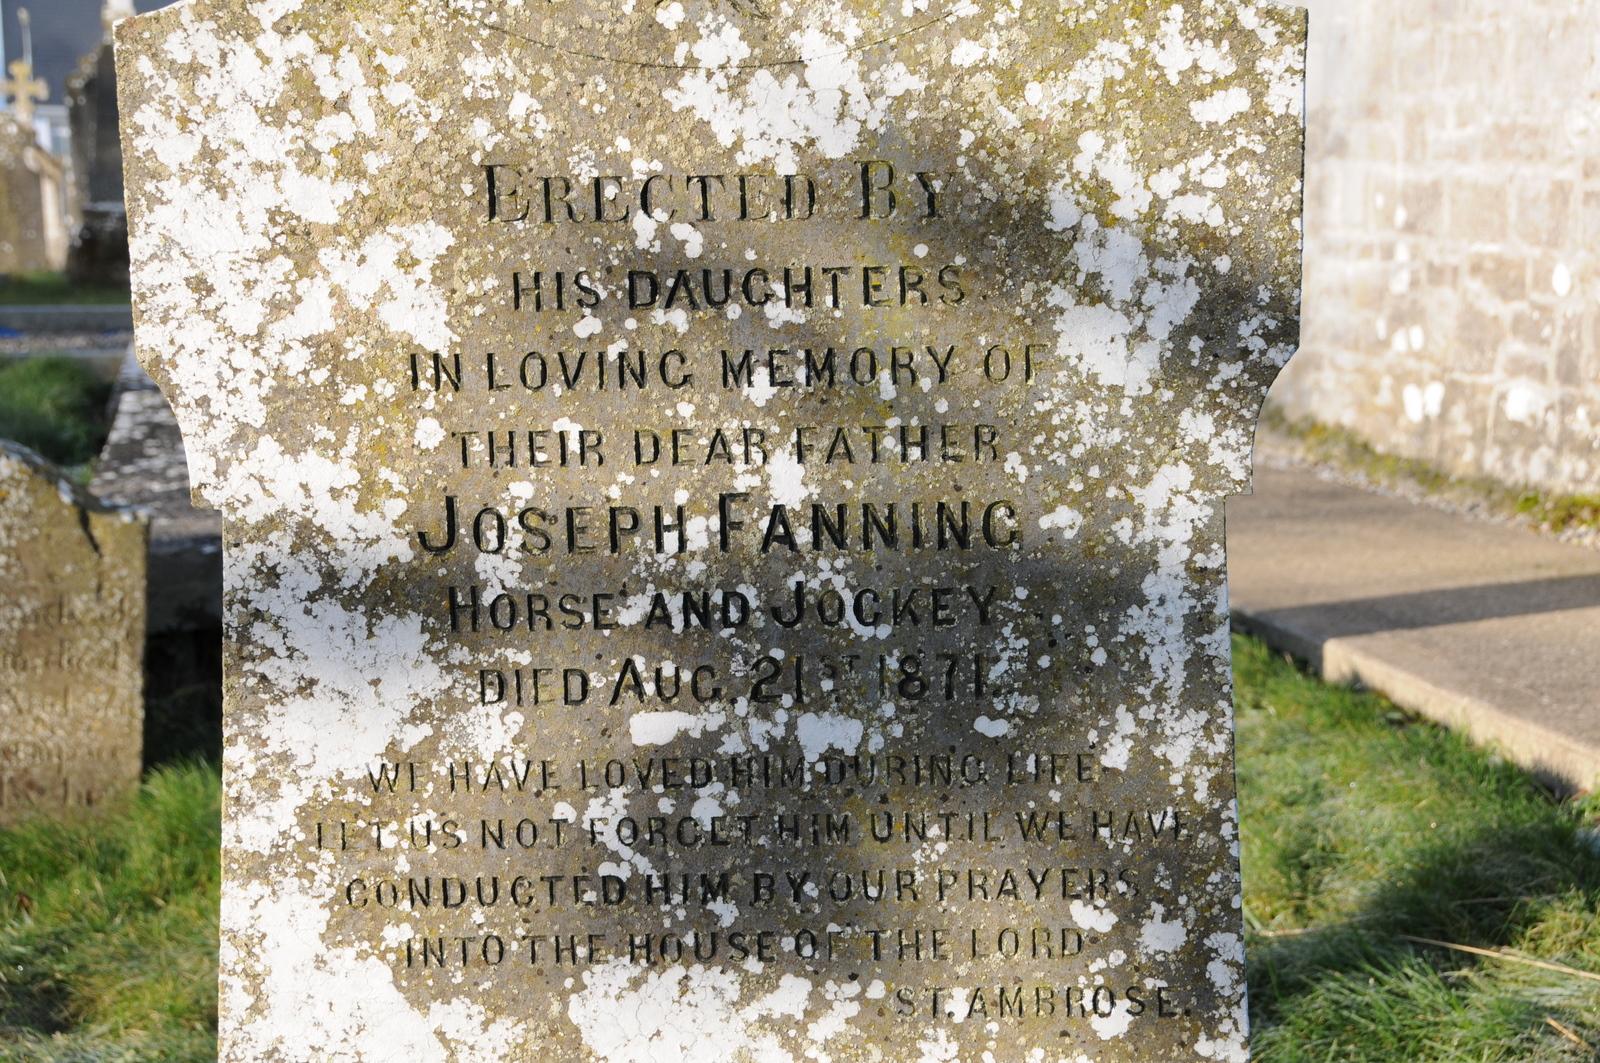 Holycross C of I Joseph Fanning Horse & Jockey